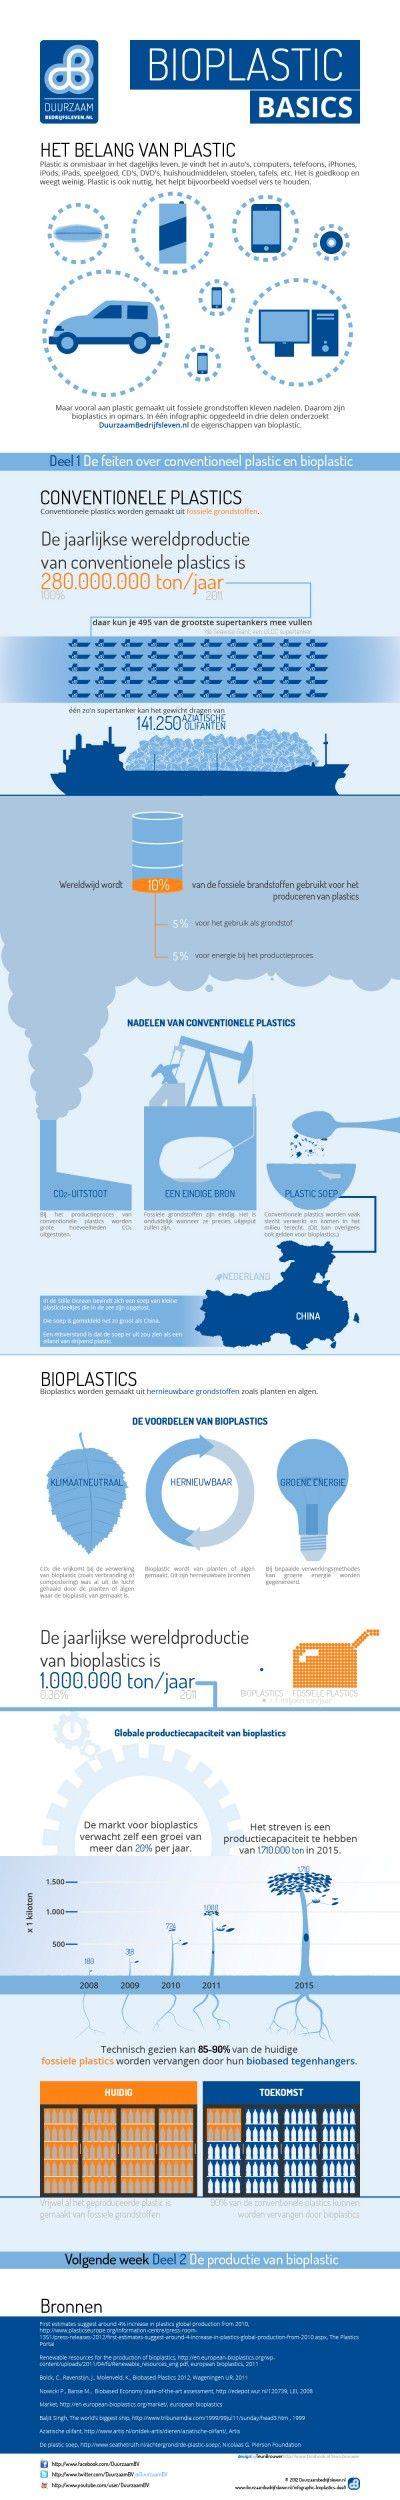 71 best Biobased images on Pinterest | Bag packaging, Product design ...